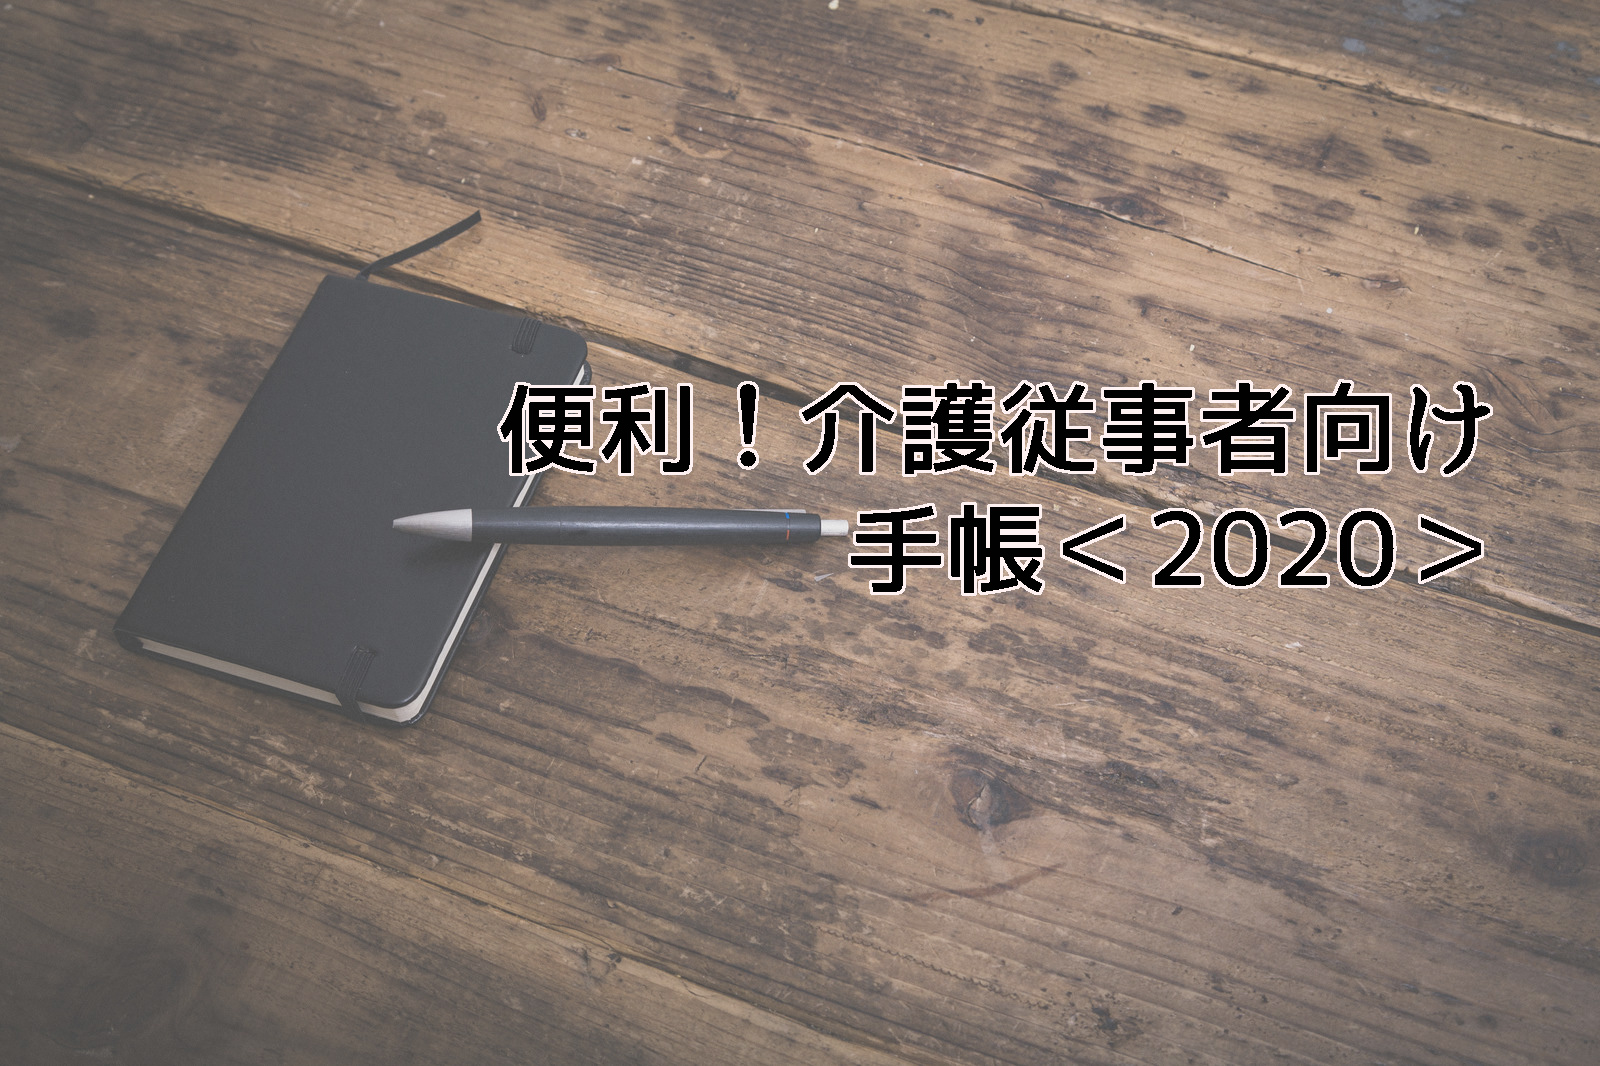 便利!介護従事者向け手帳<2020>